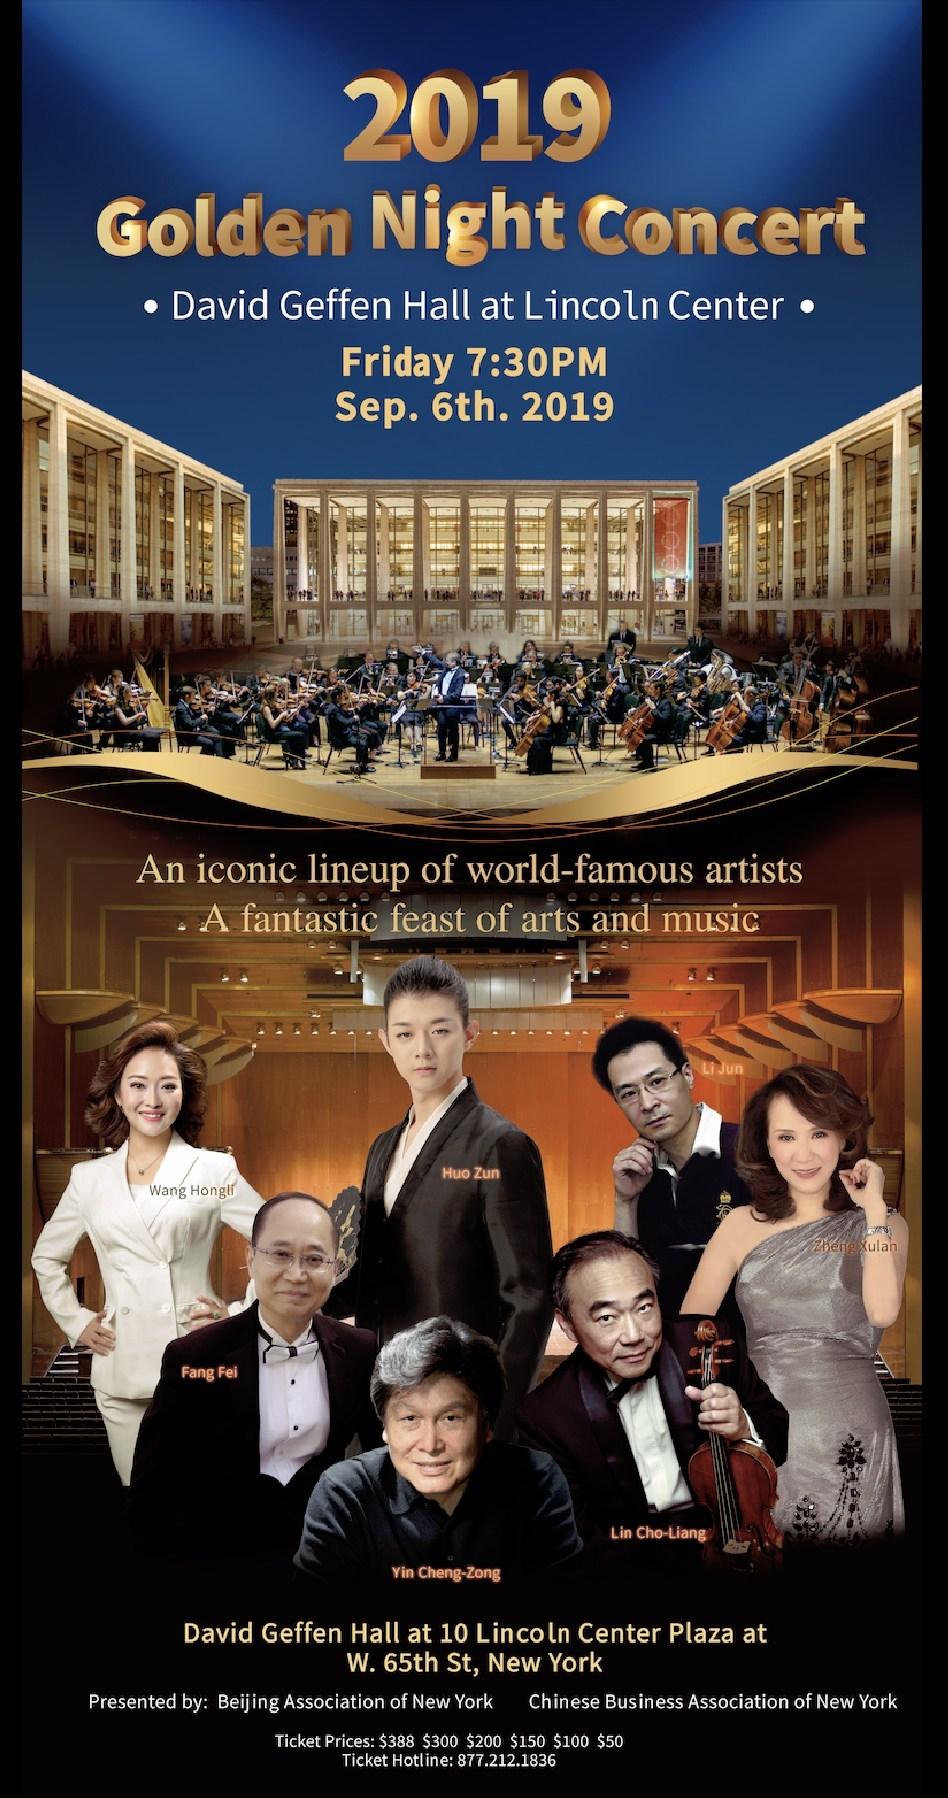 2019 Golden Night Concert Poster